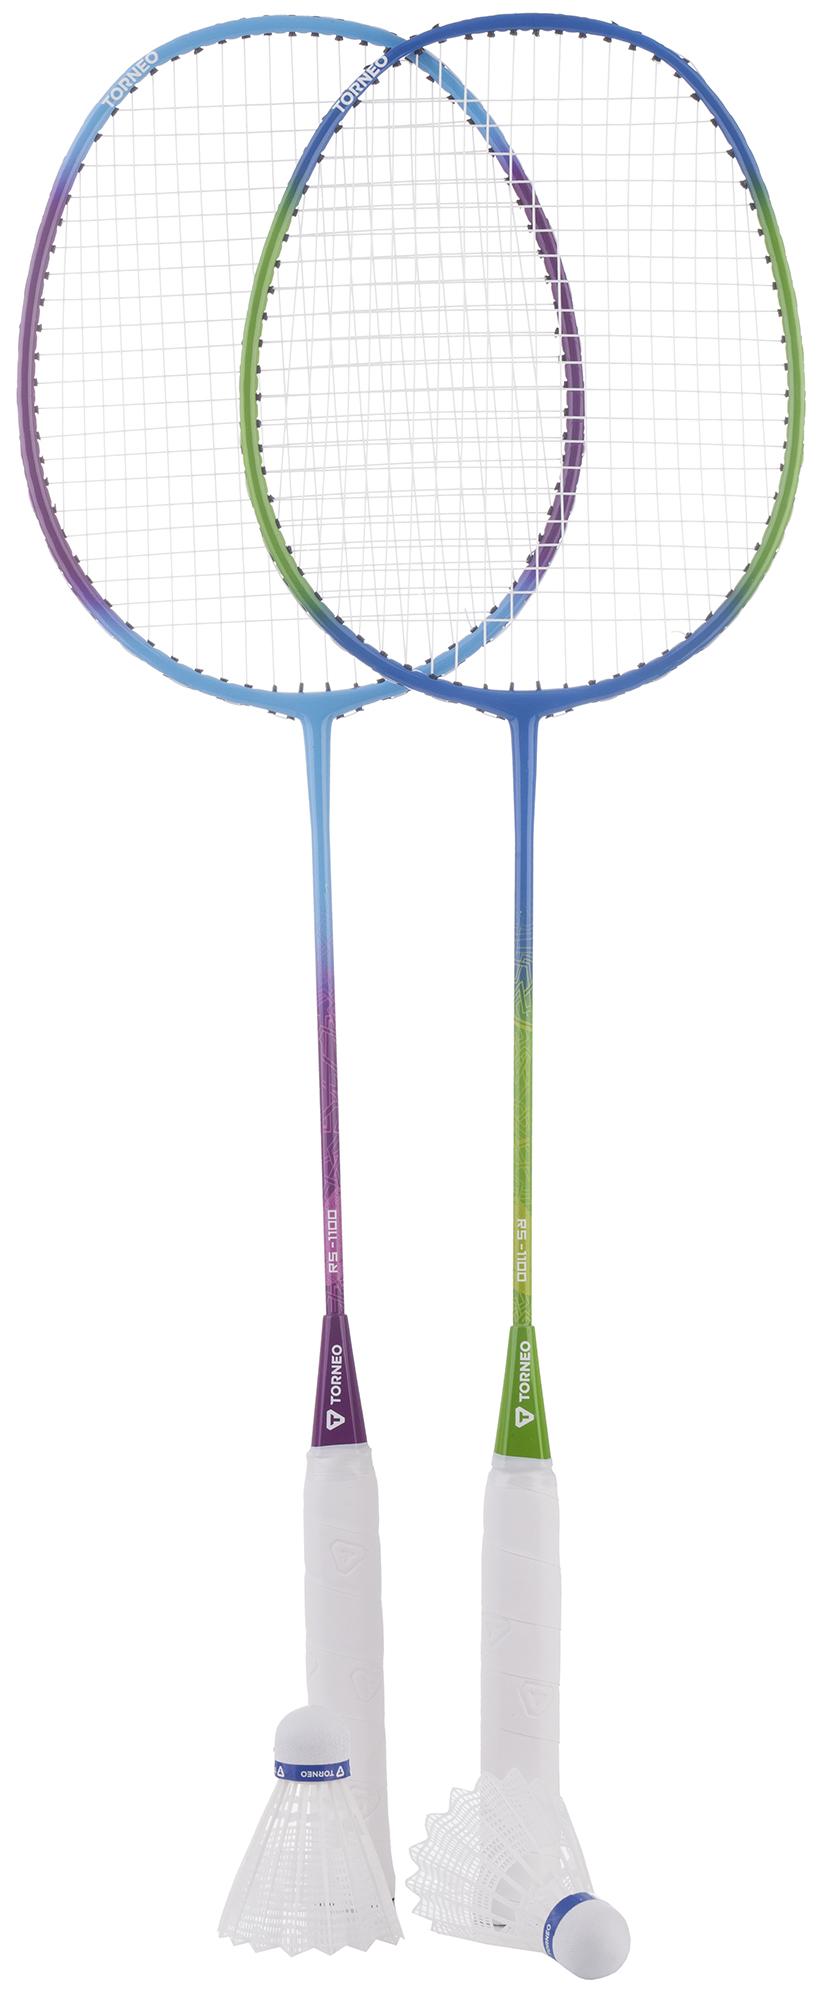 Torneo Набор для бадминтона Torneo (2 ракетки, 2 волана, чехол) torneo набор для бадминтона torneo размер без размера